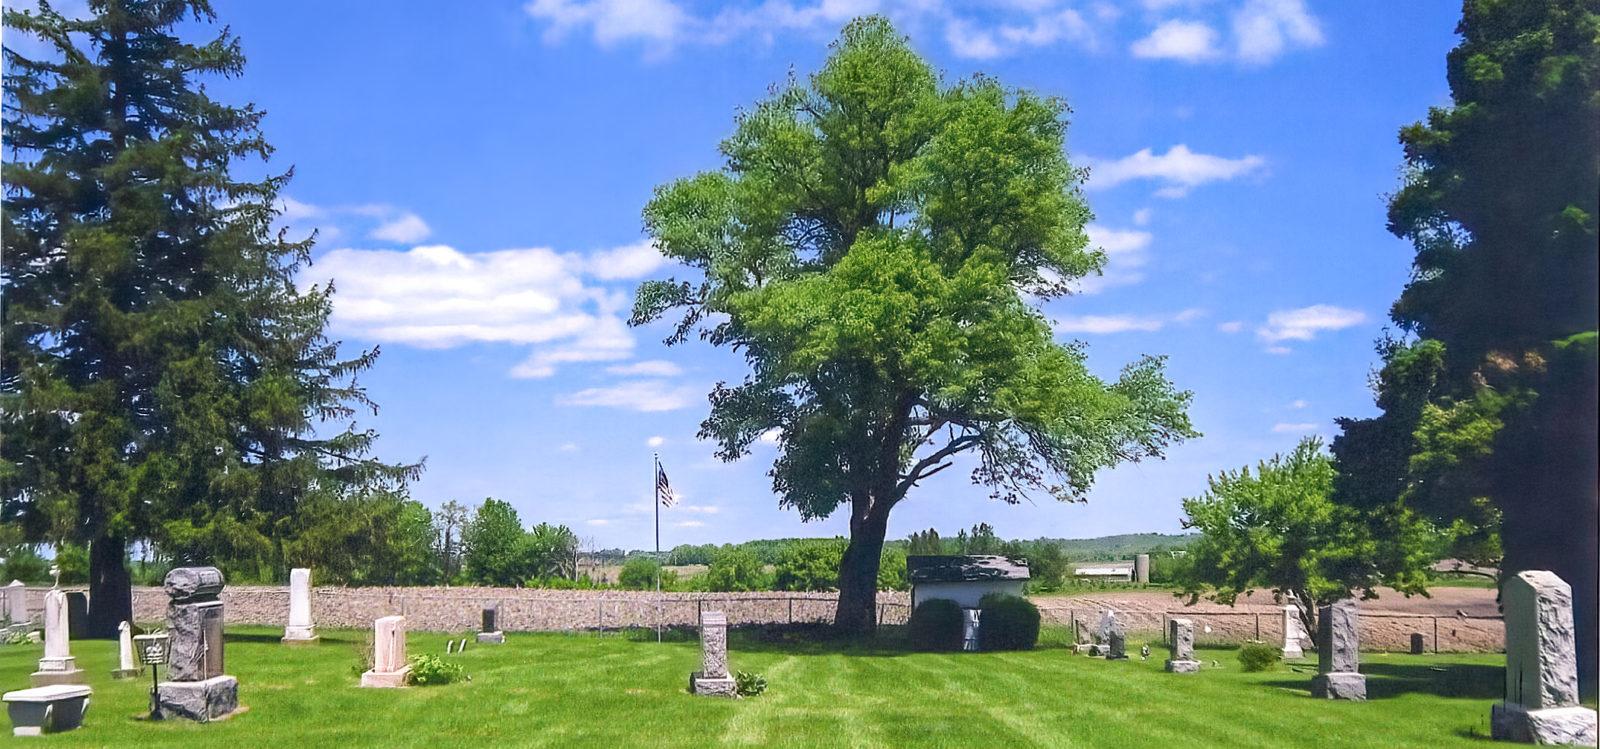 German Union Cemetery: